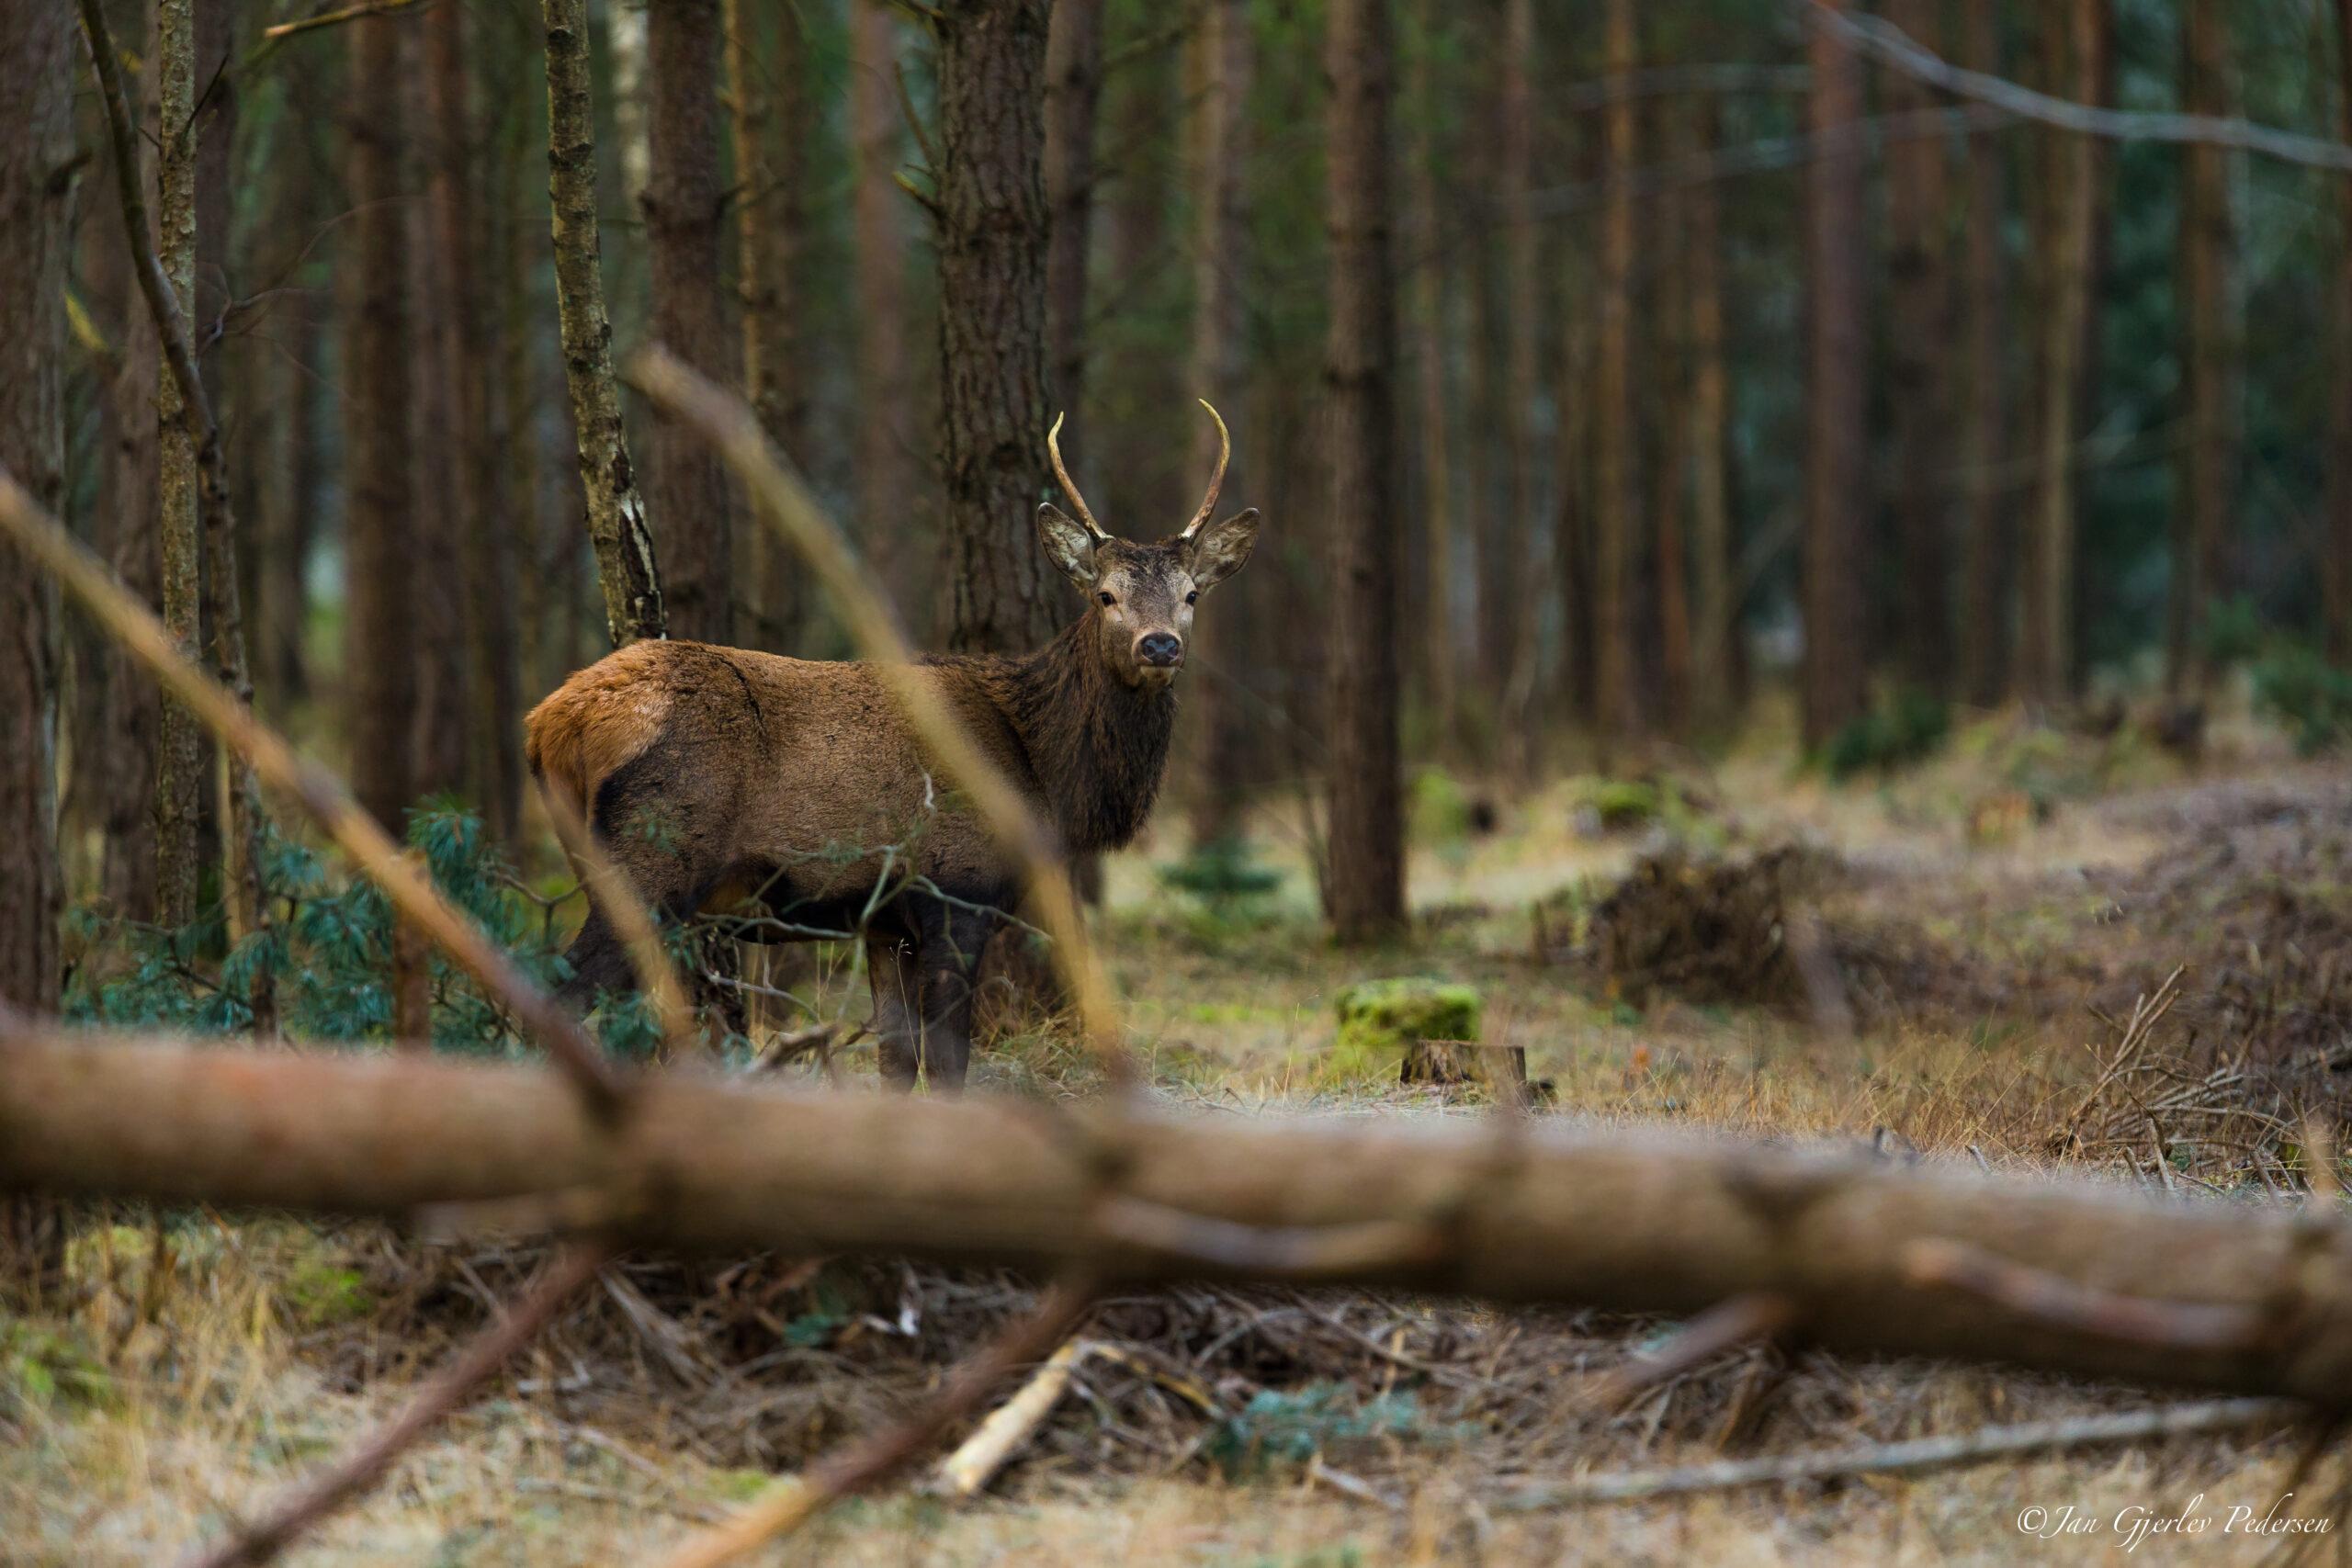 Fotojagt og natur i Halsnæs